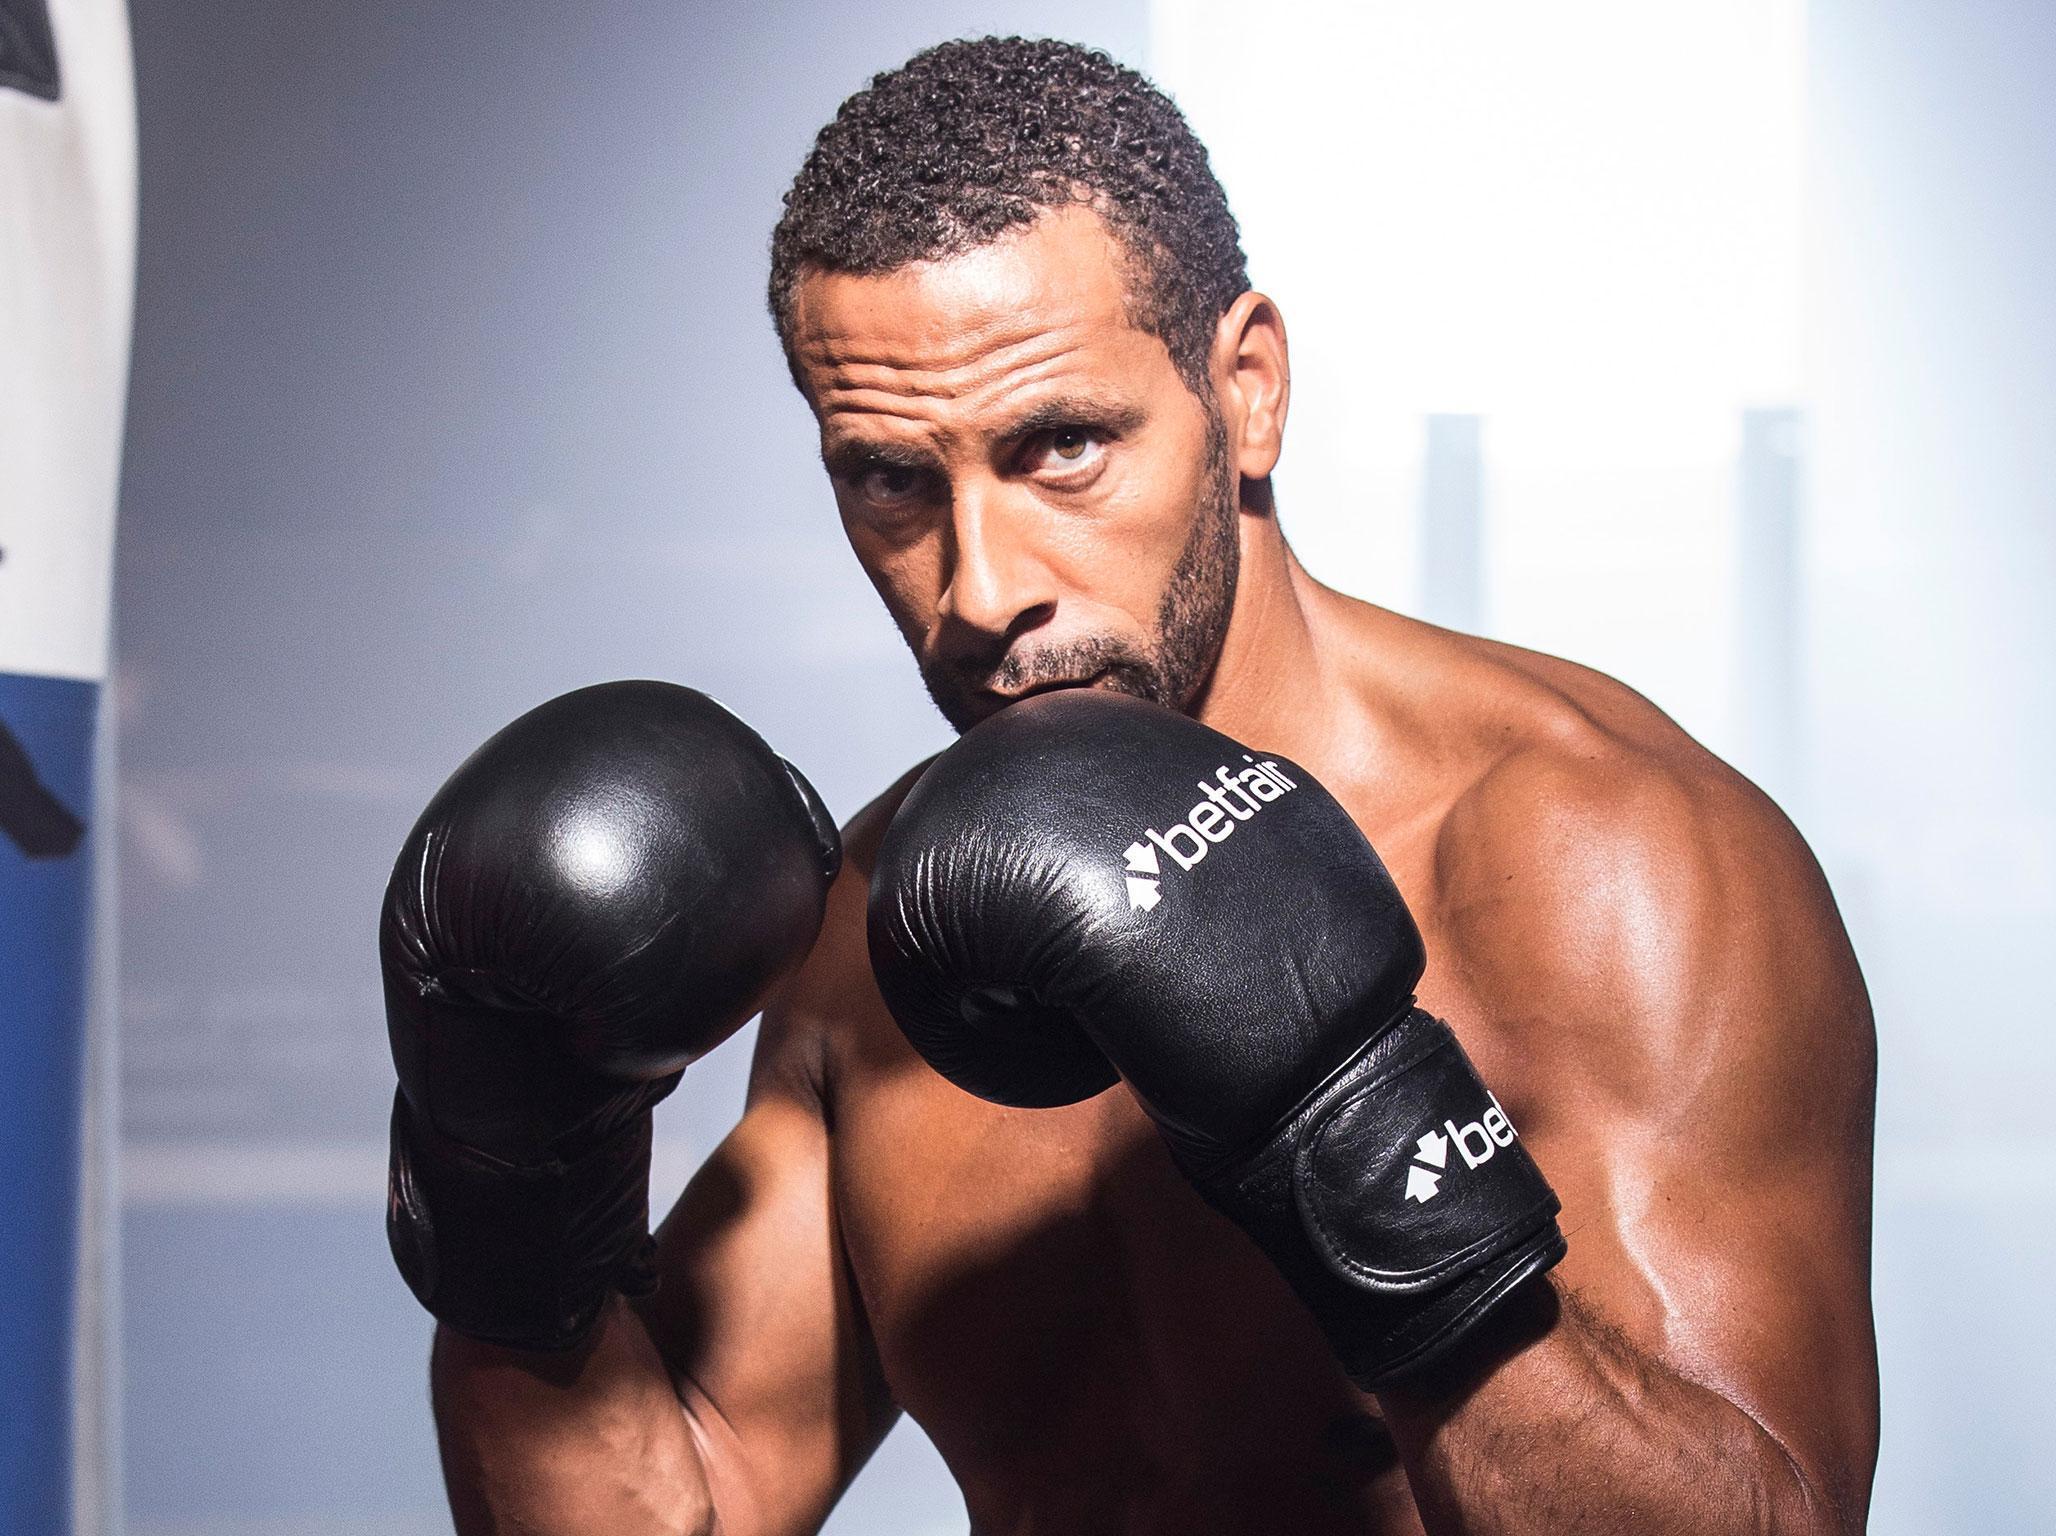 Rio Ferdinand launches bid to be e professional boxer as ex